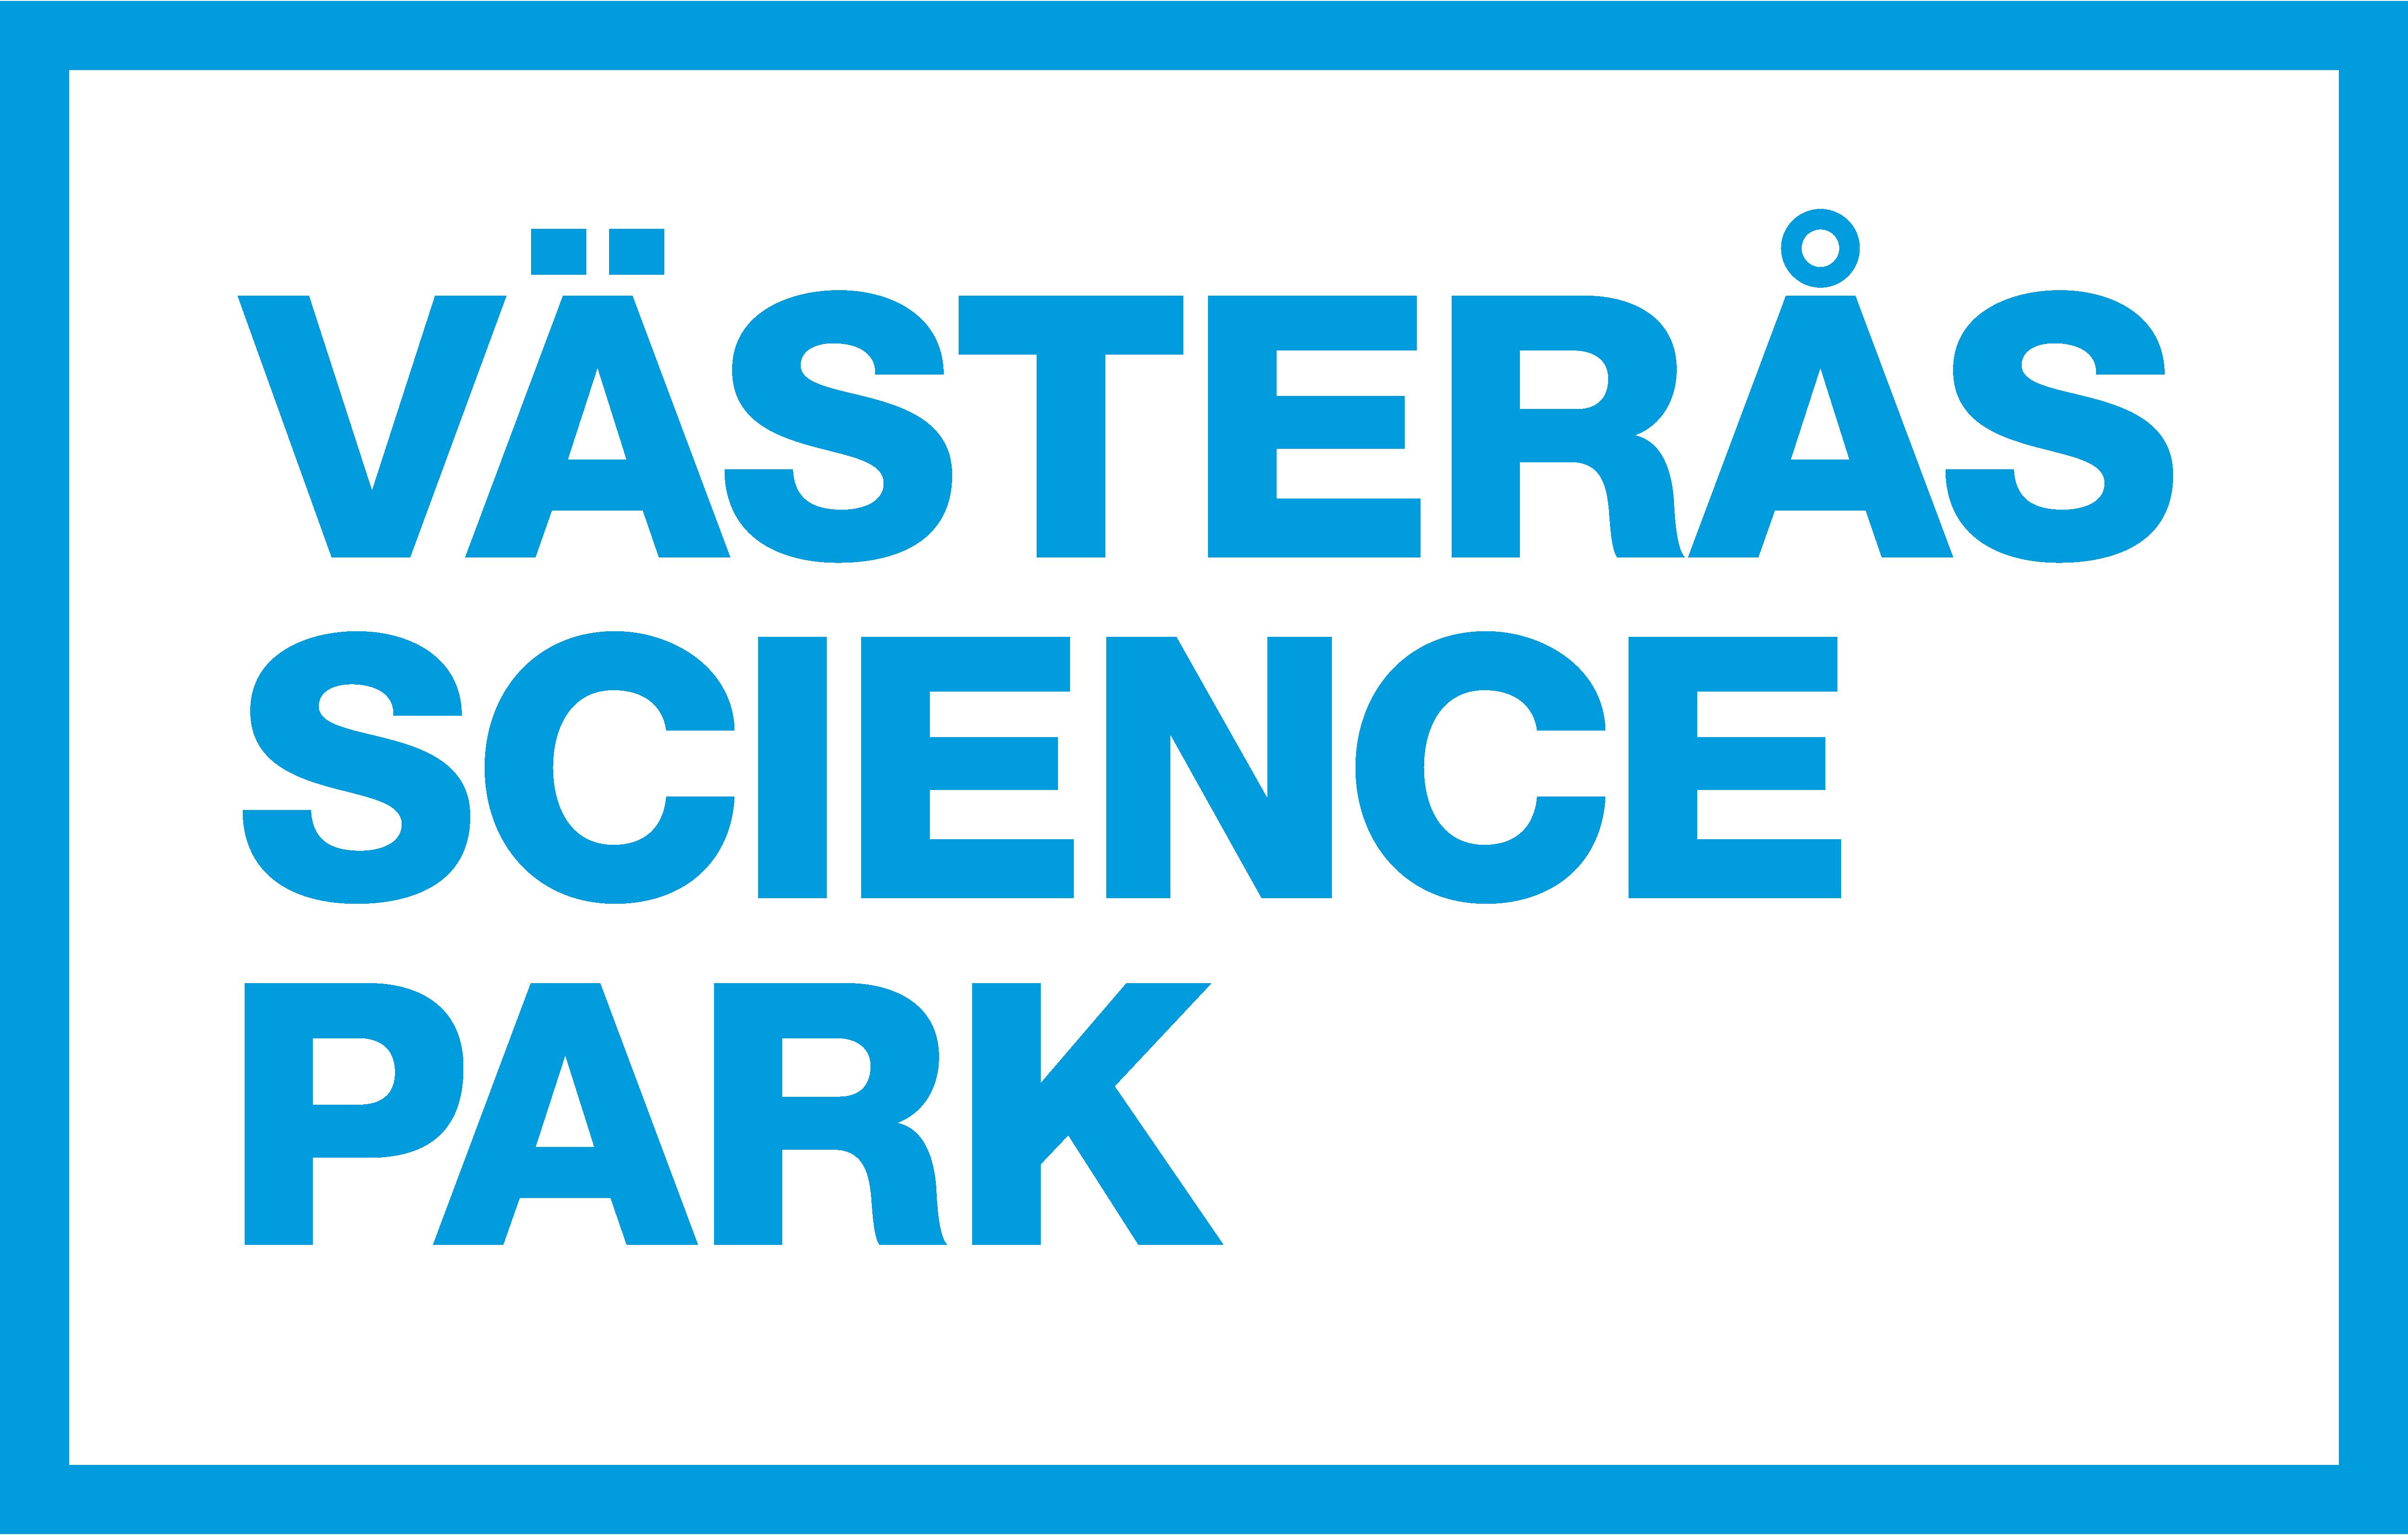 Västerås Sciencepark